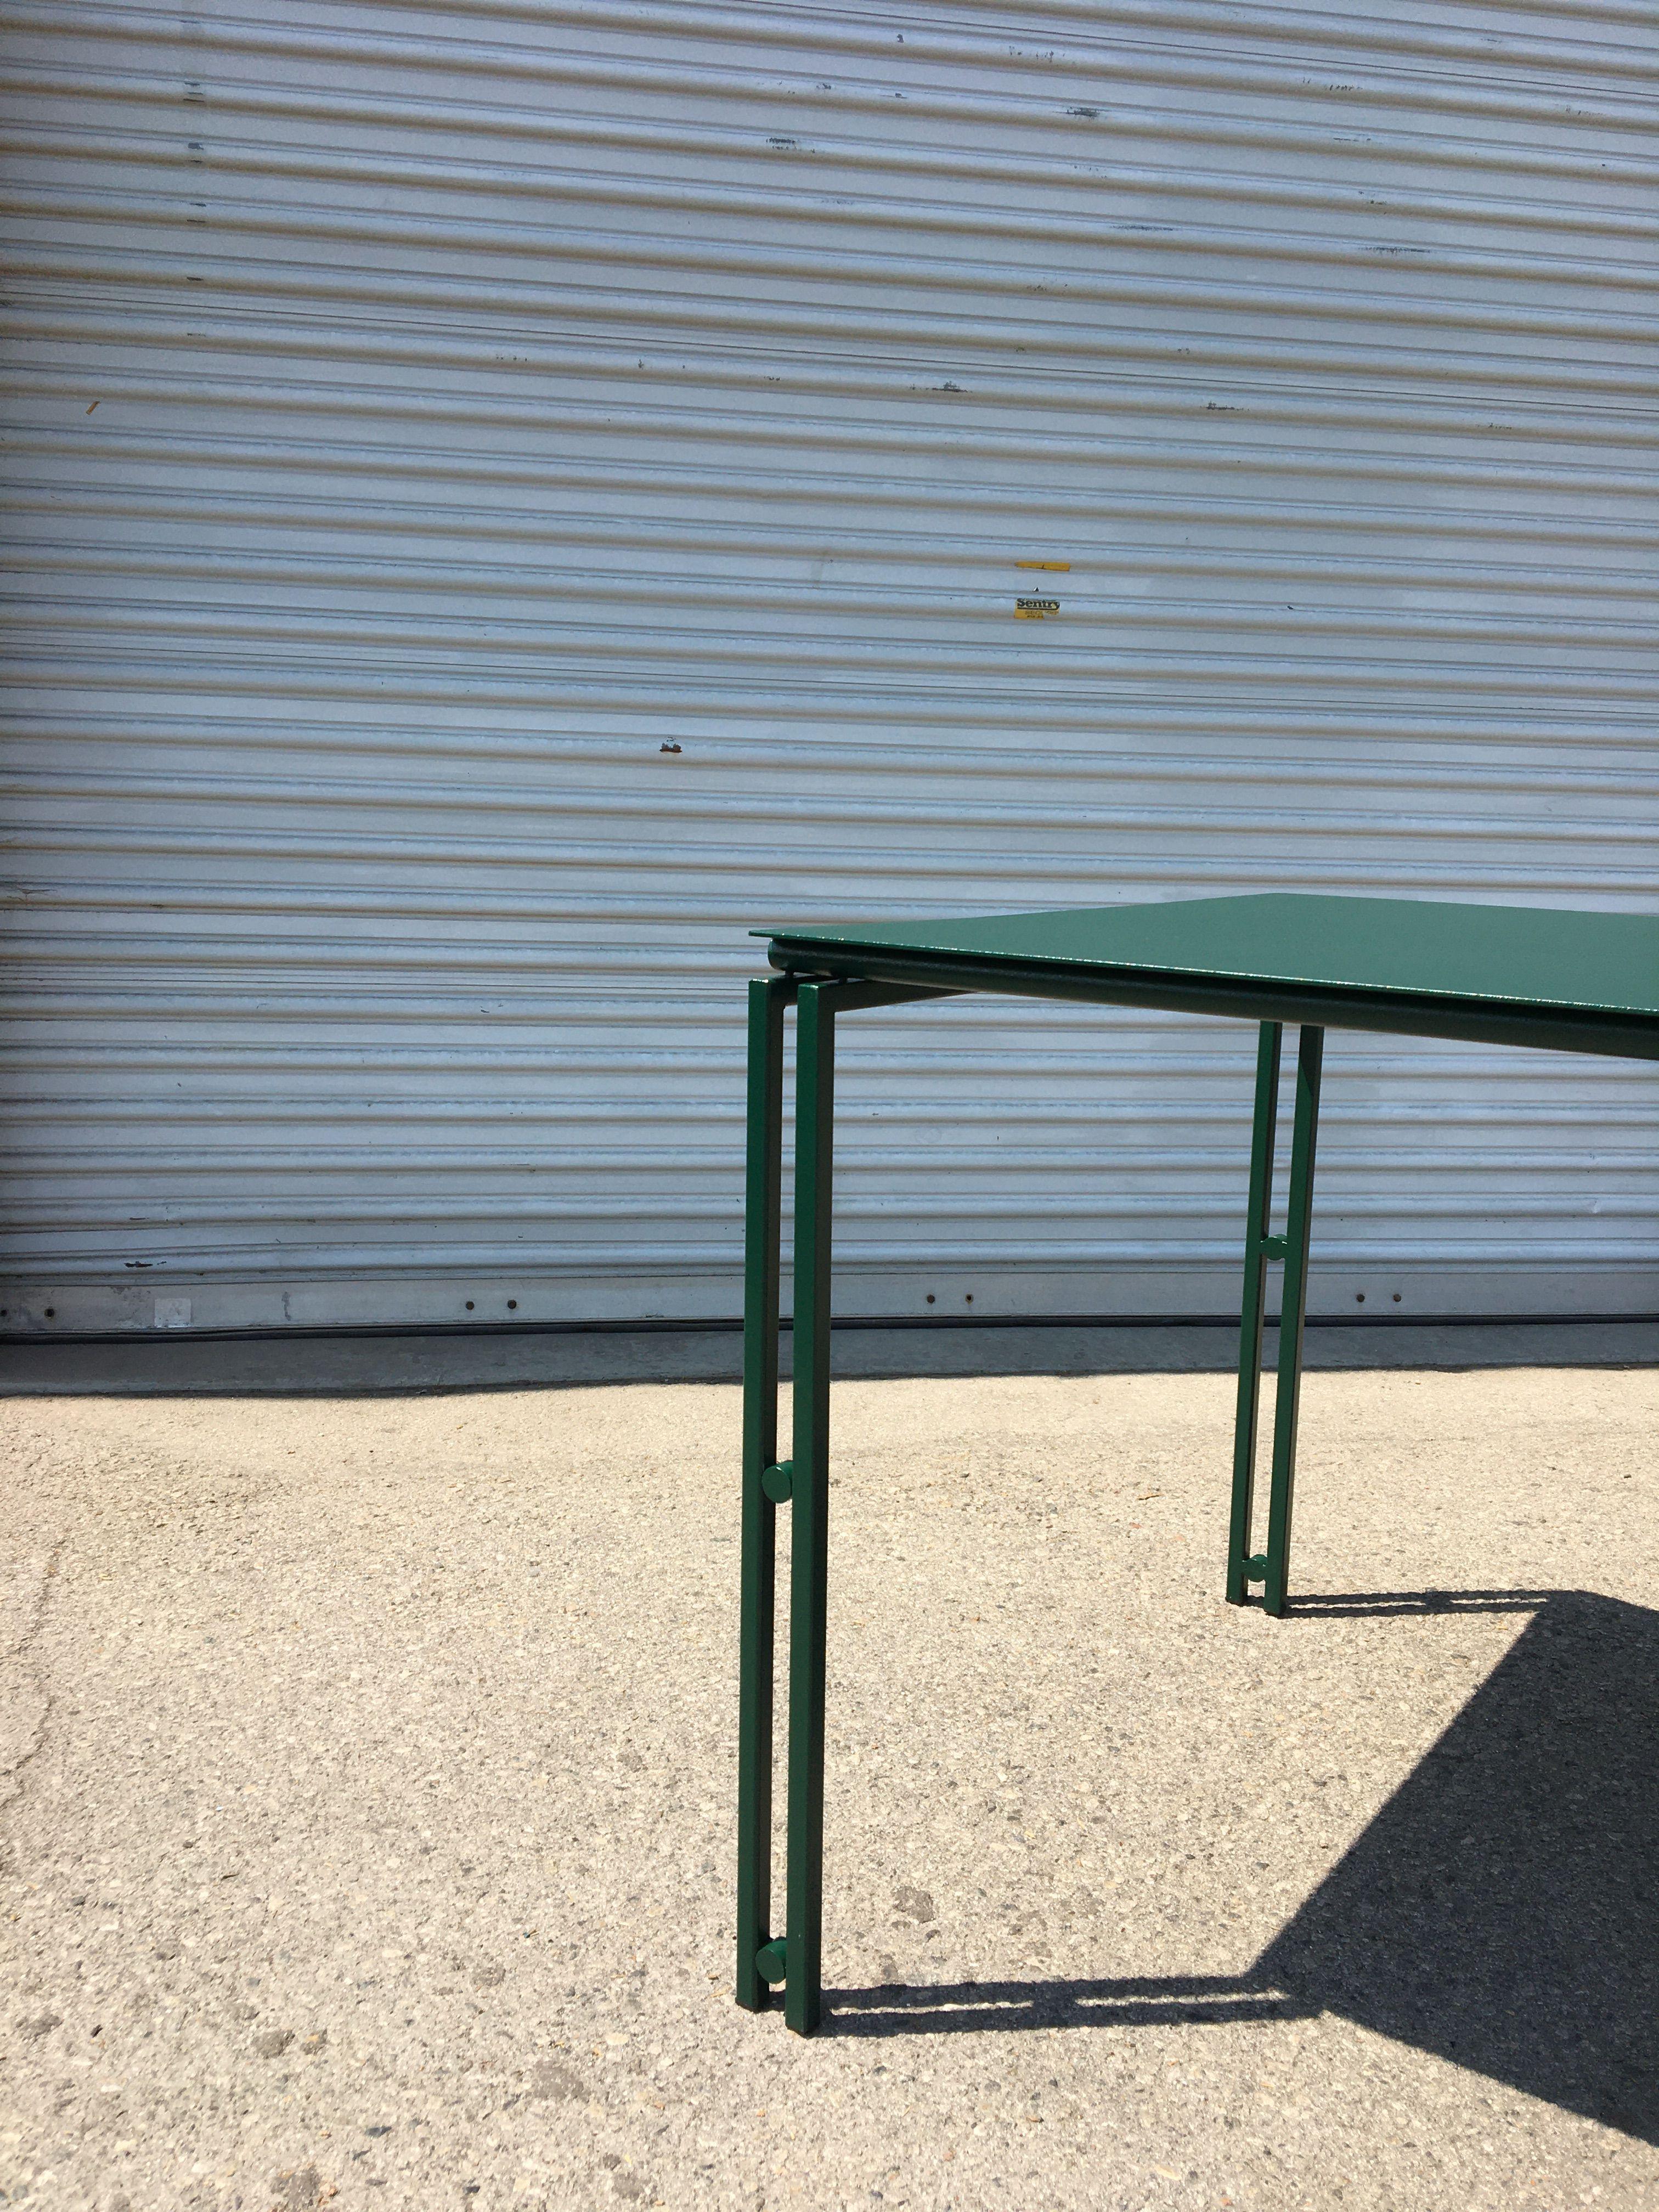 Suspension Metal Set - Breakfast Size product image 13